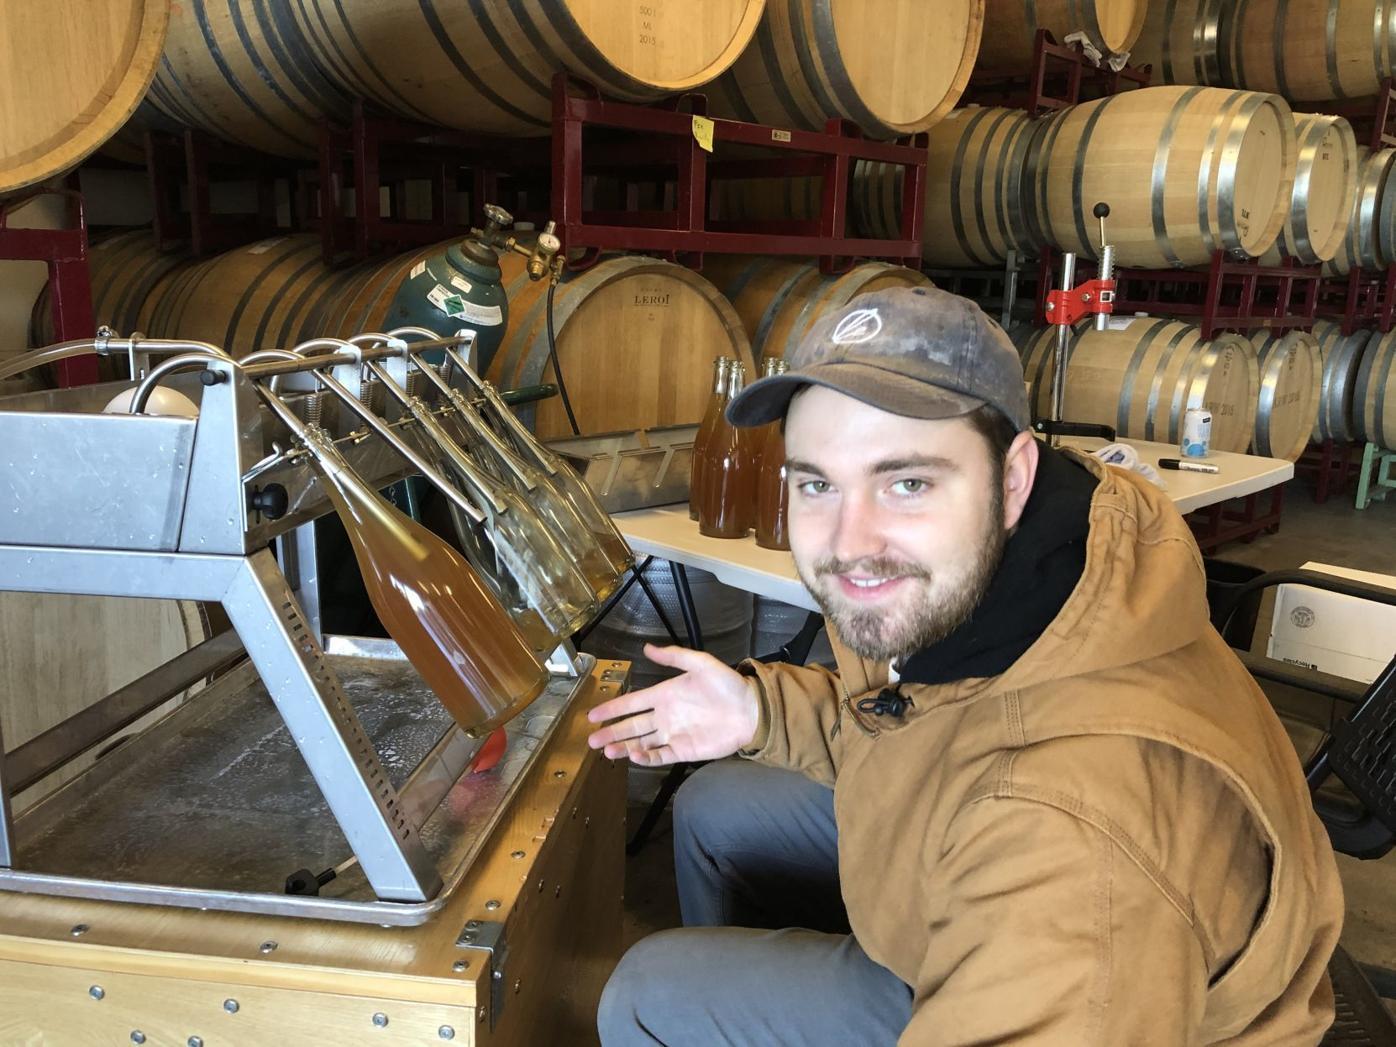 051820 Montemar Winery 15